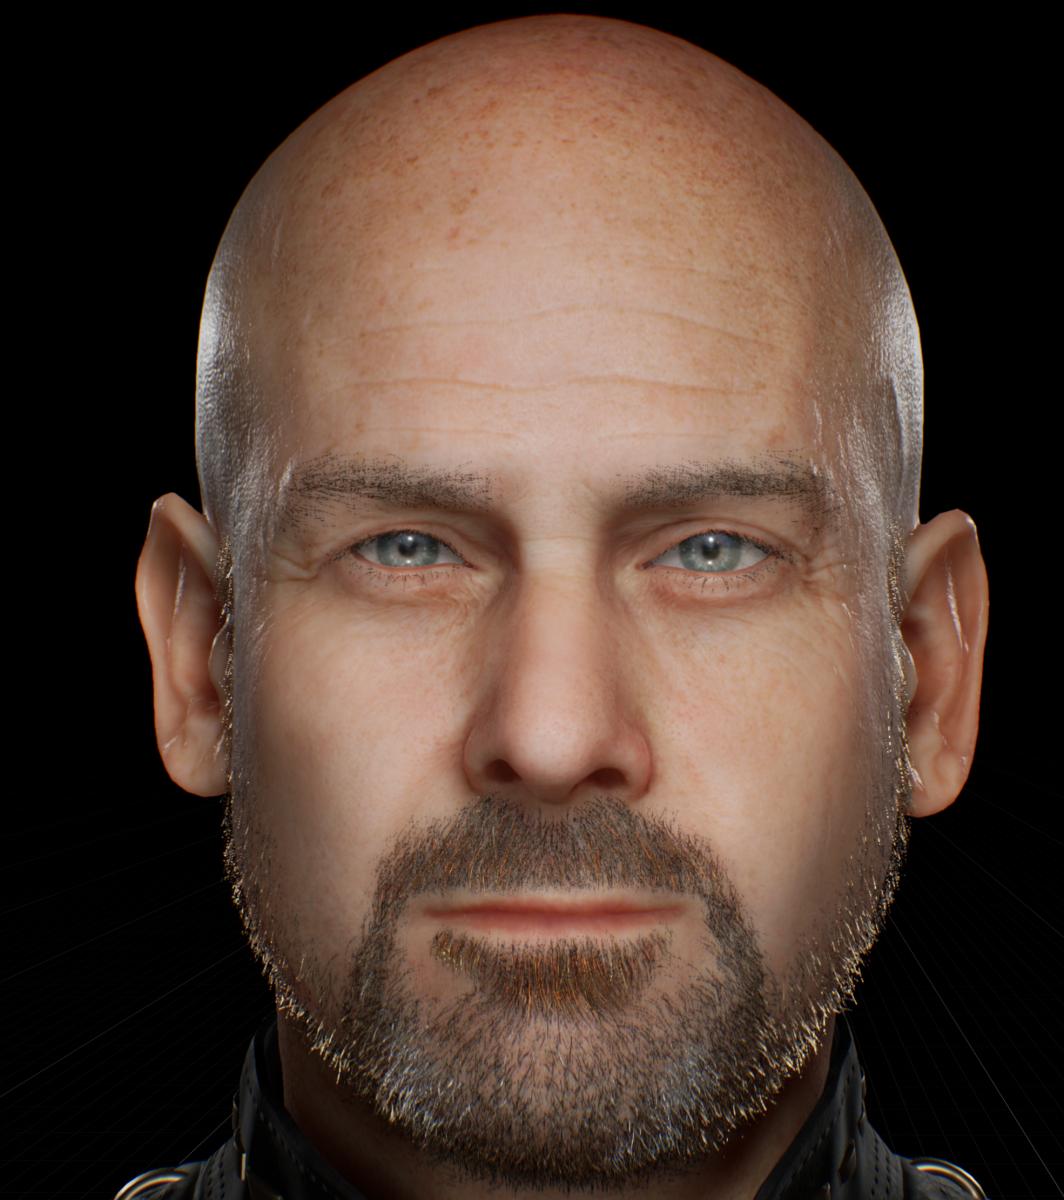 Isaiah Martin's avatar.